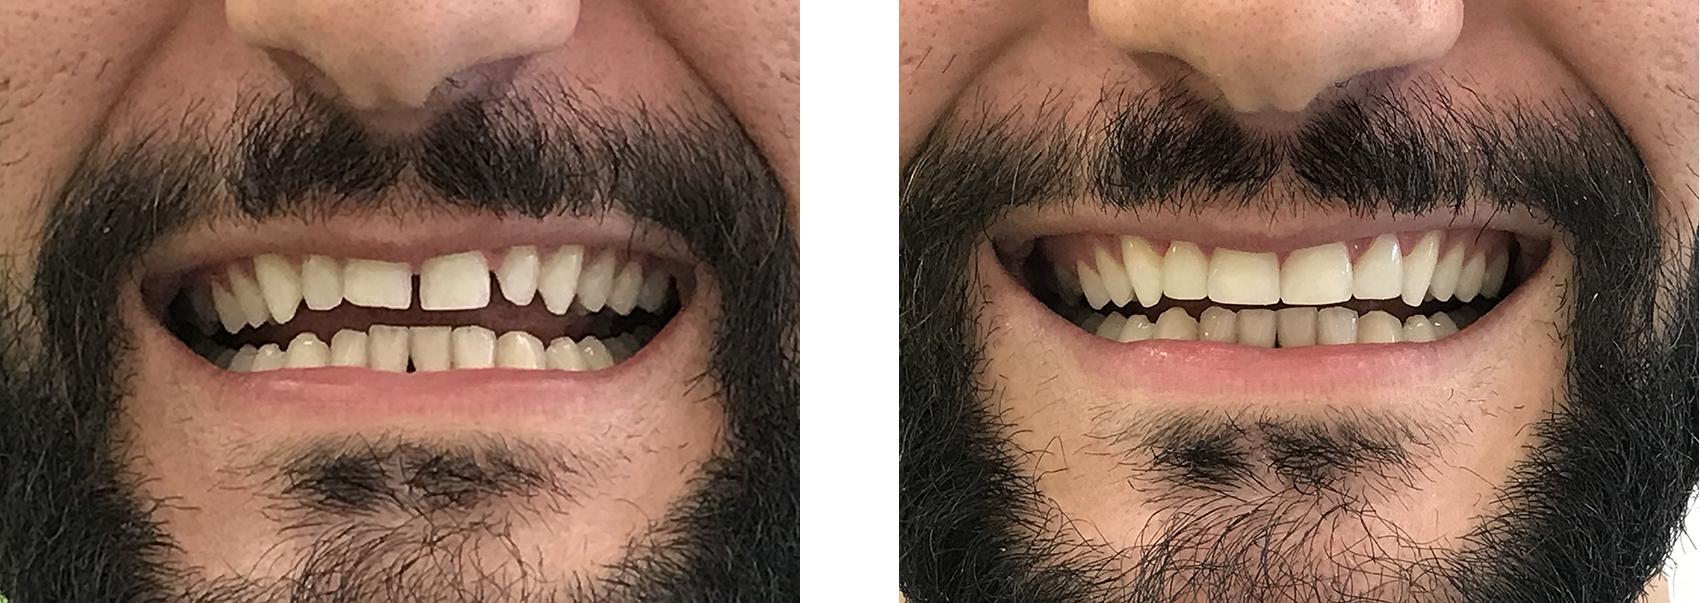 bonding δοντιών 1η εικόνα